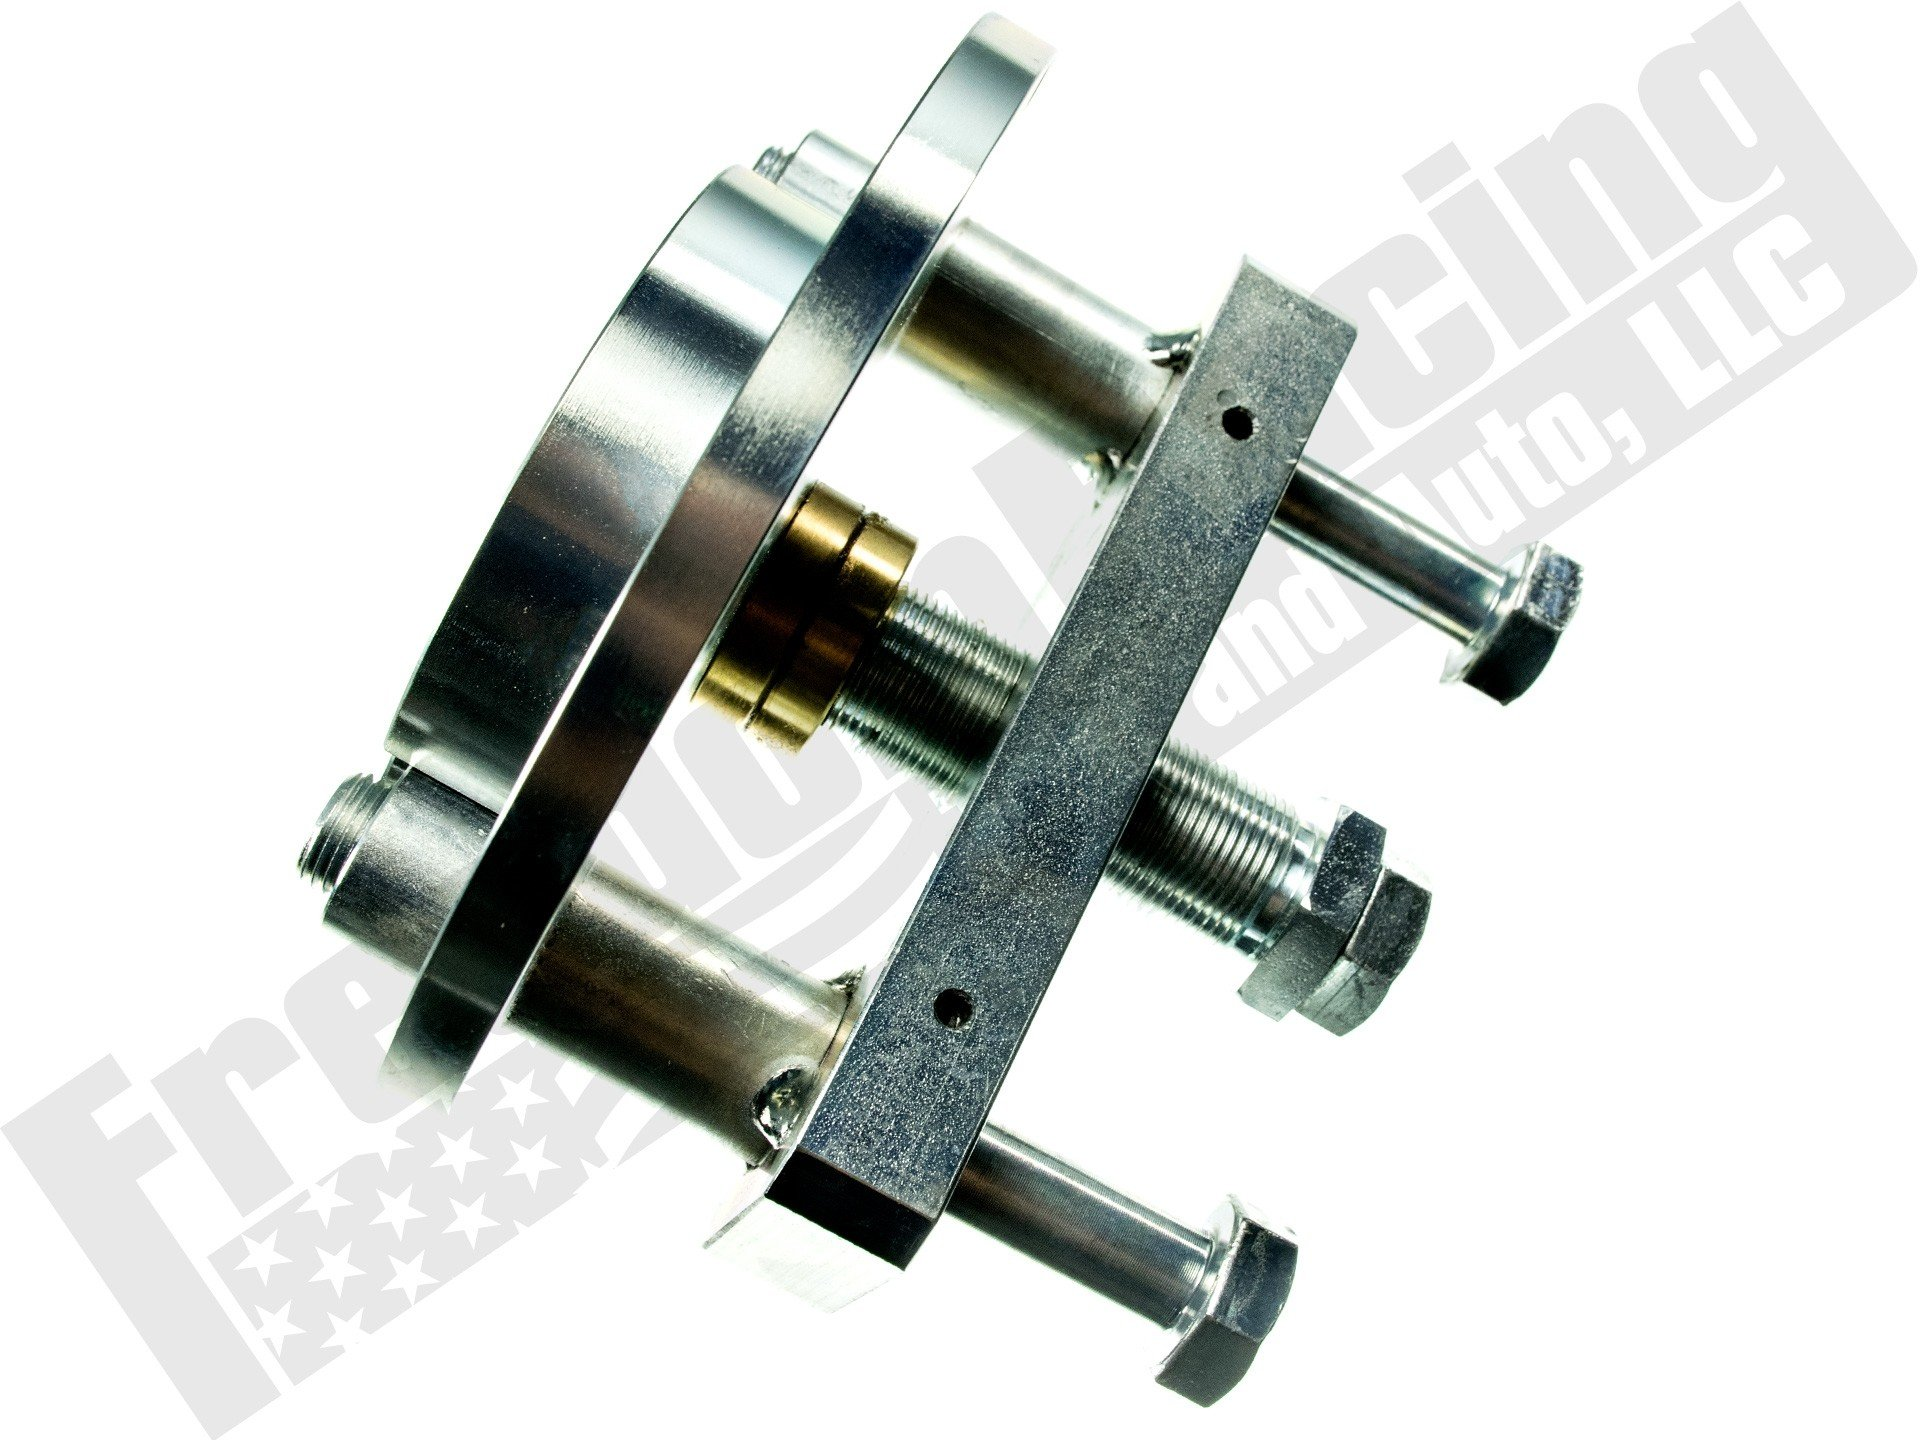 Detroit Diesel DD13 DD15 Front Crank Seal Remover Installer W541589023300 Alt